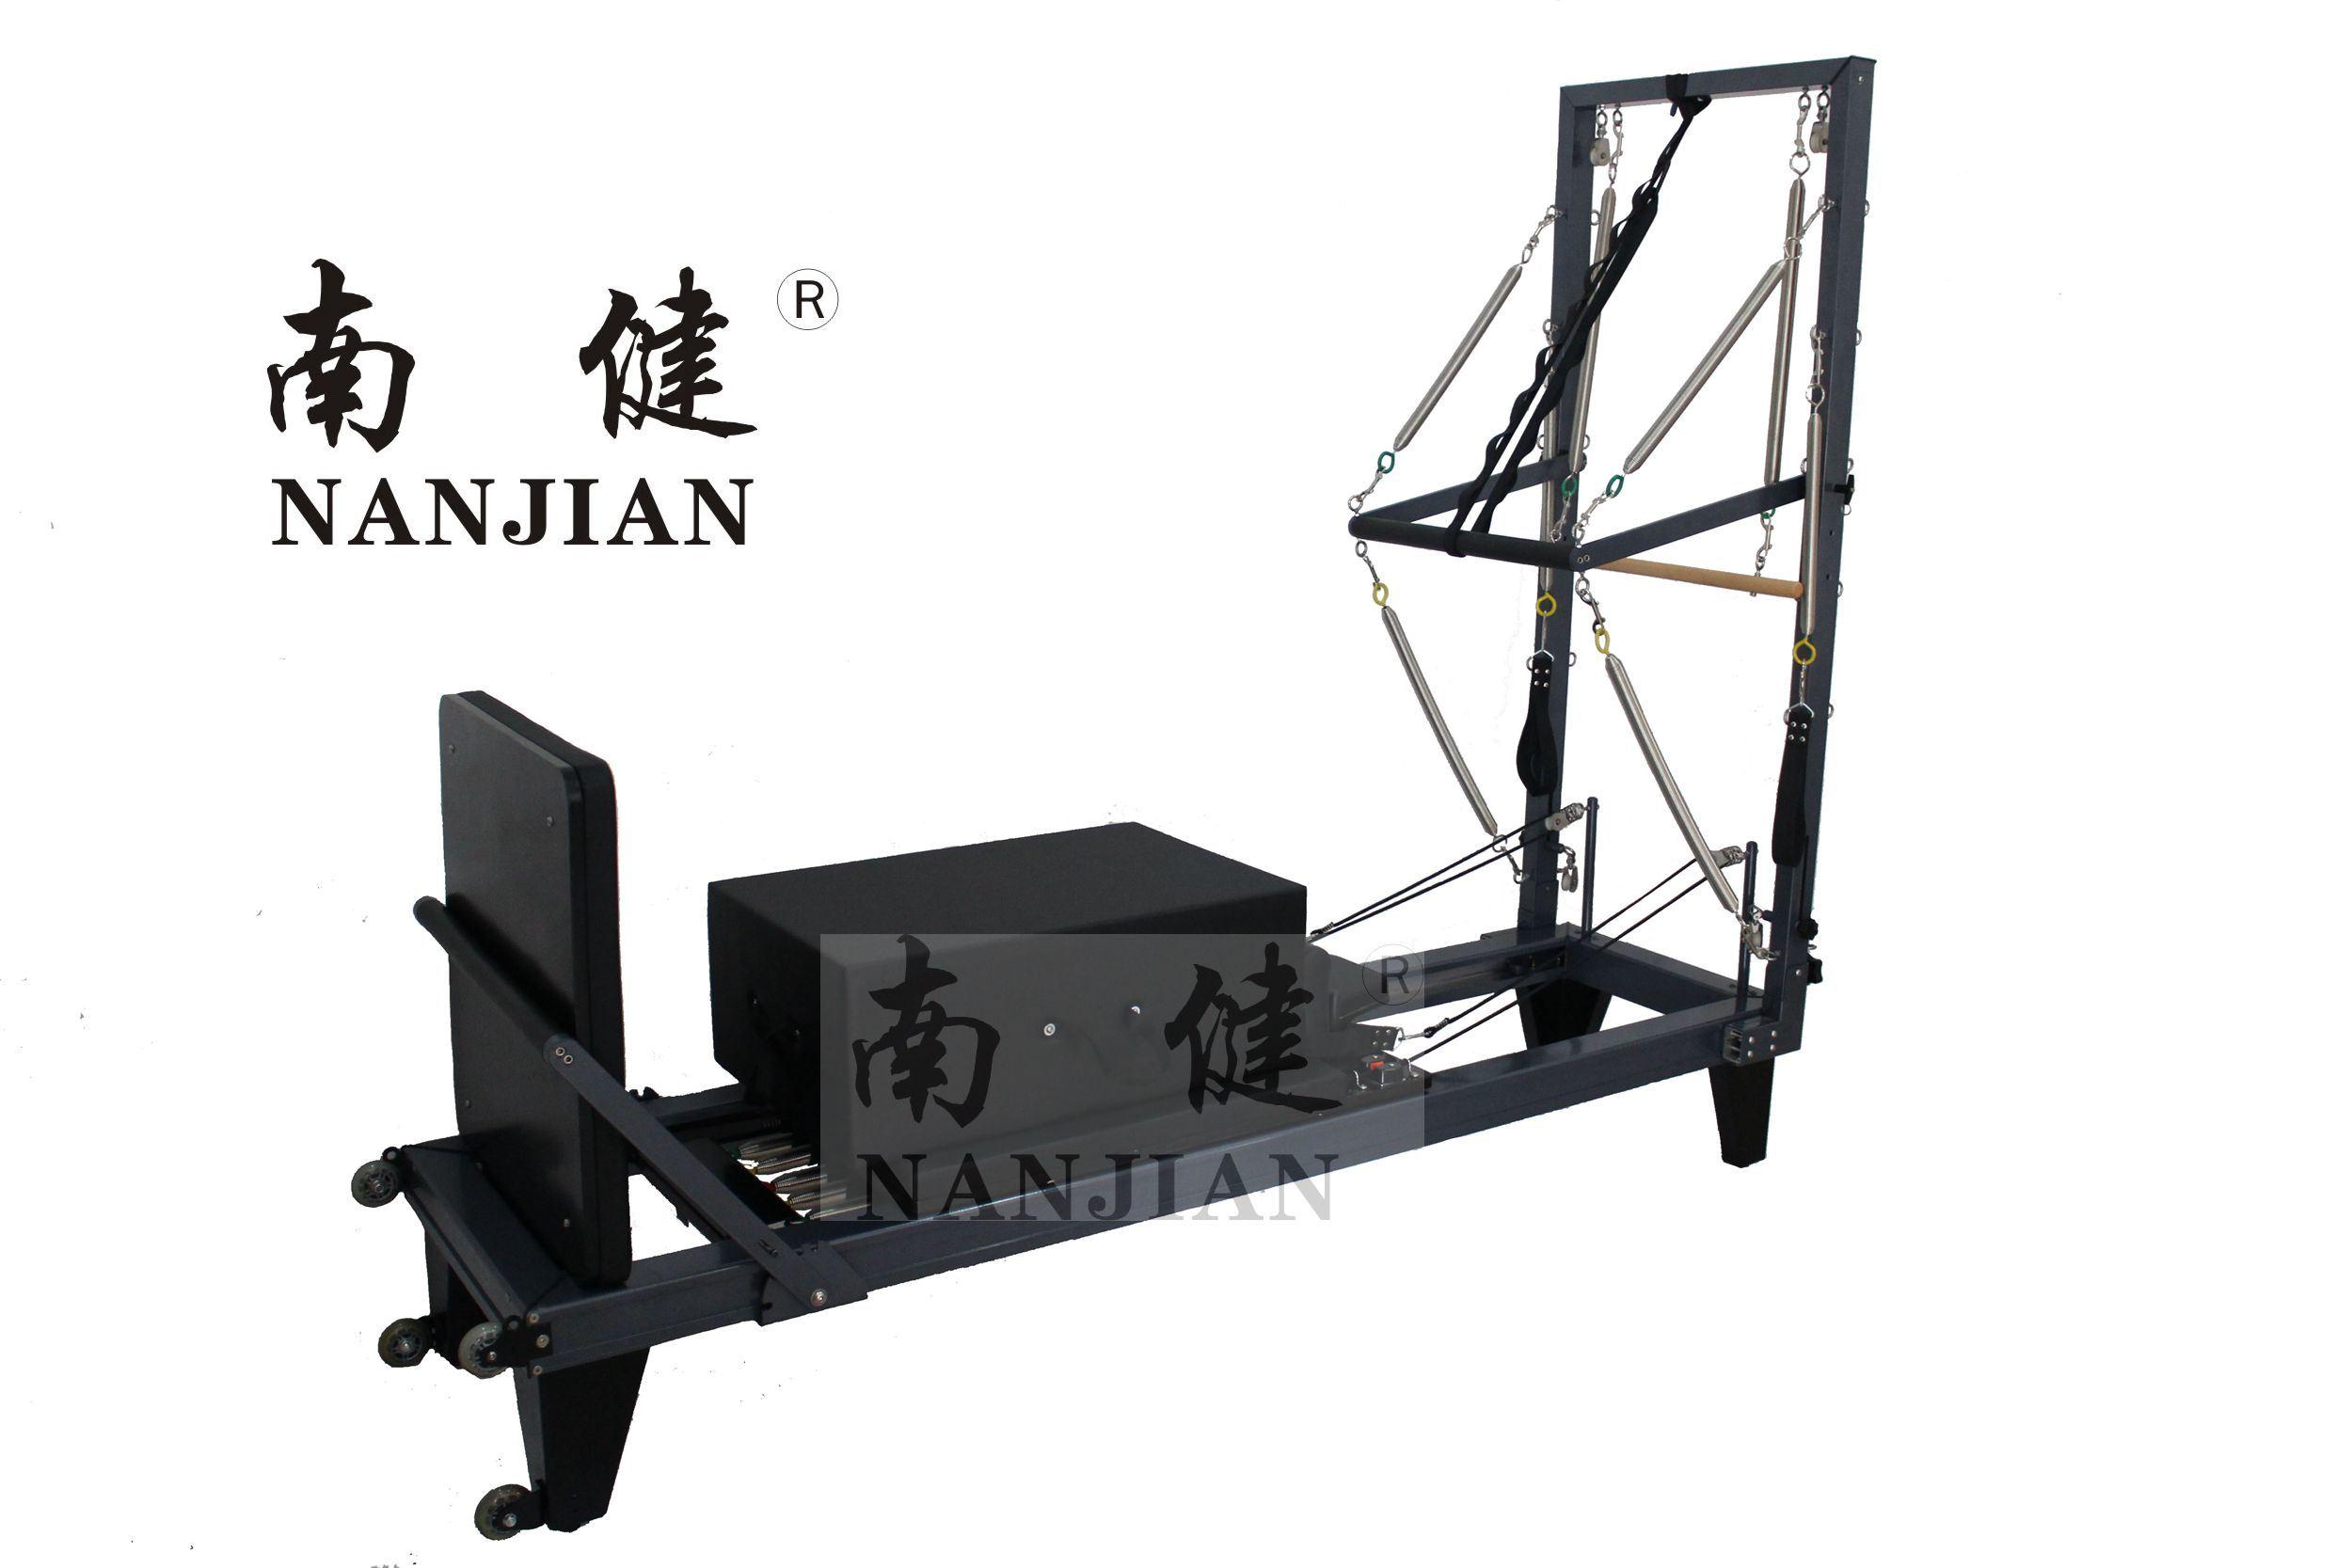 Nanjian Aluminium Pilates Reformer with Half Trapeze